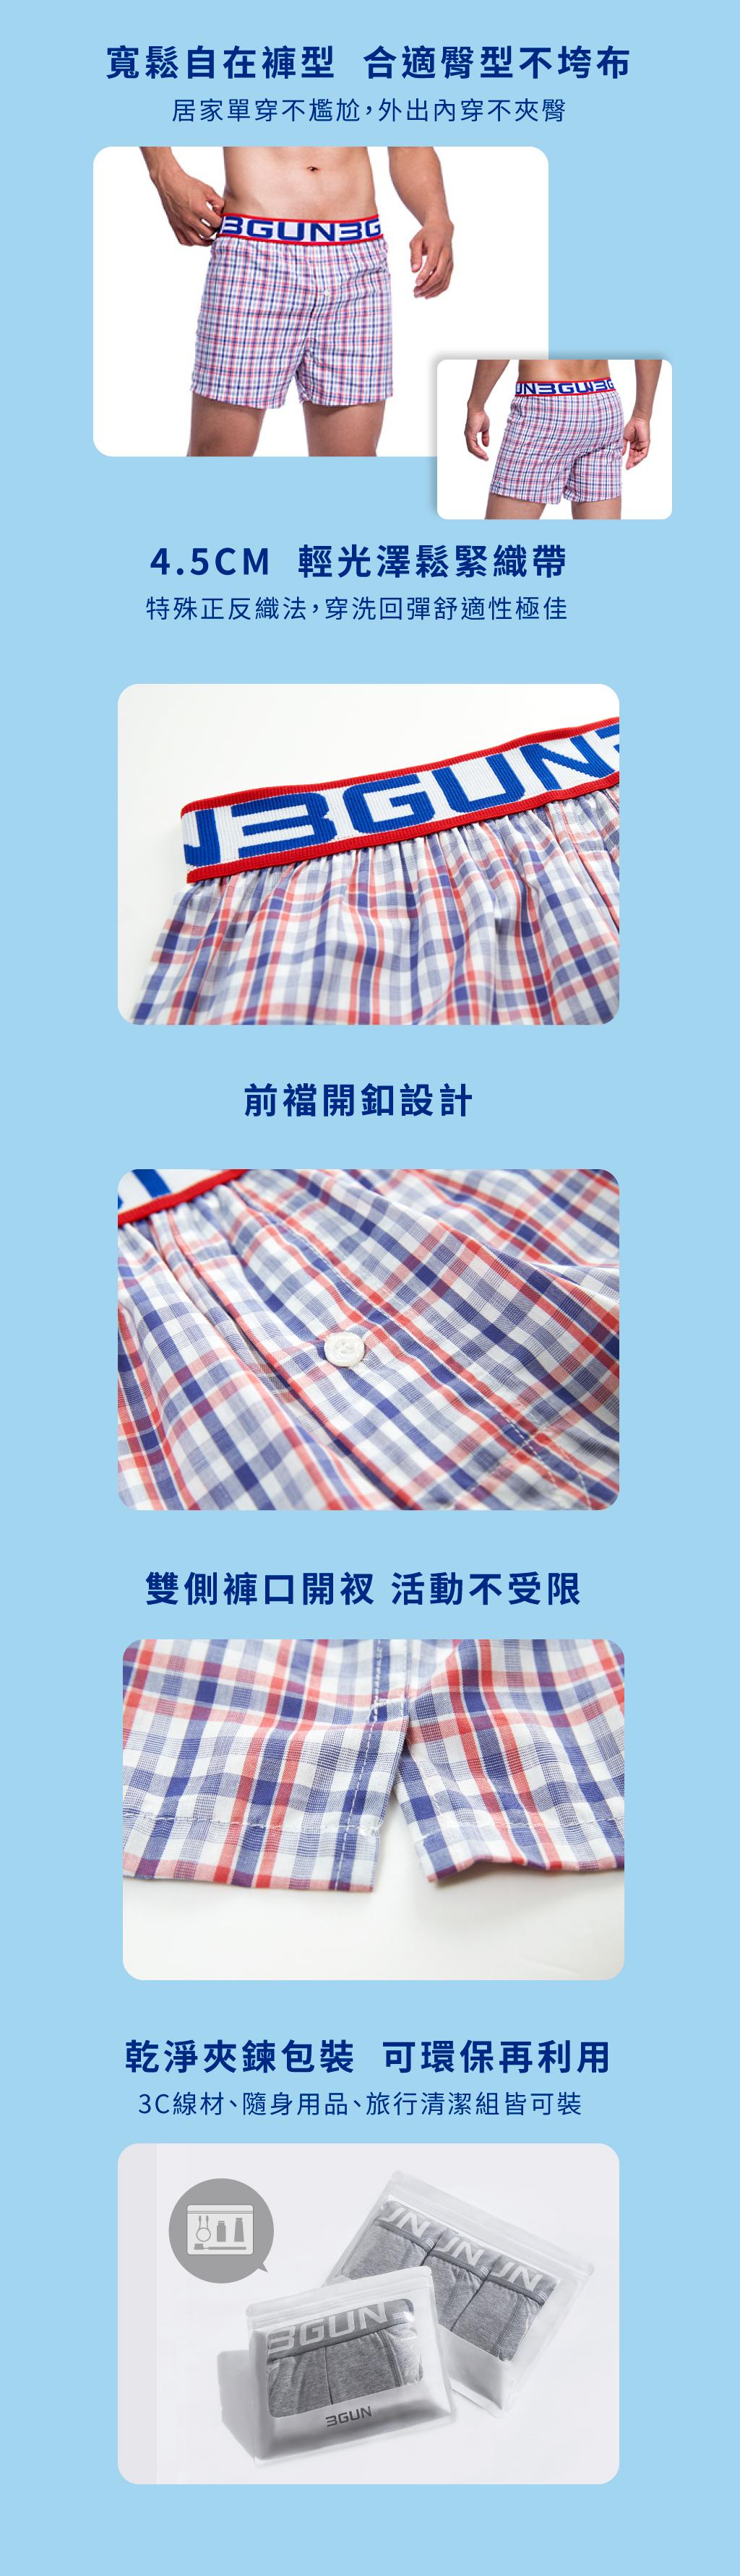 3GUN |男性時尚內衣褲MIT品牌-都會布褲-舒適純棉男平織四角平口褲